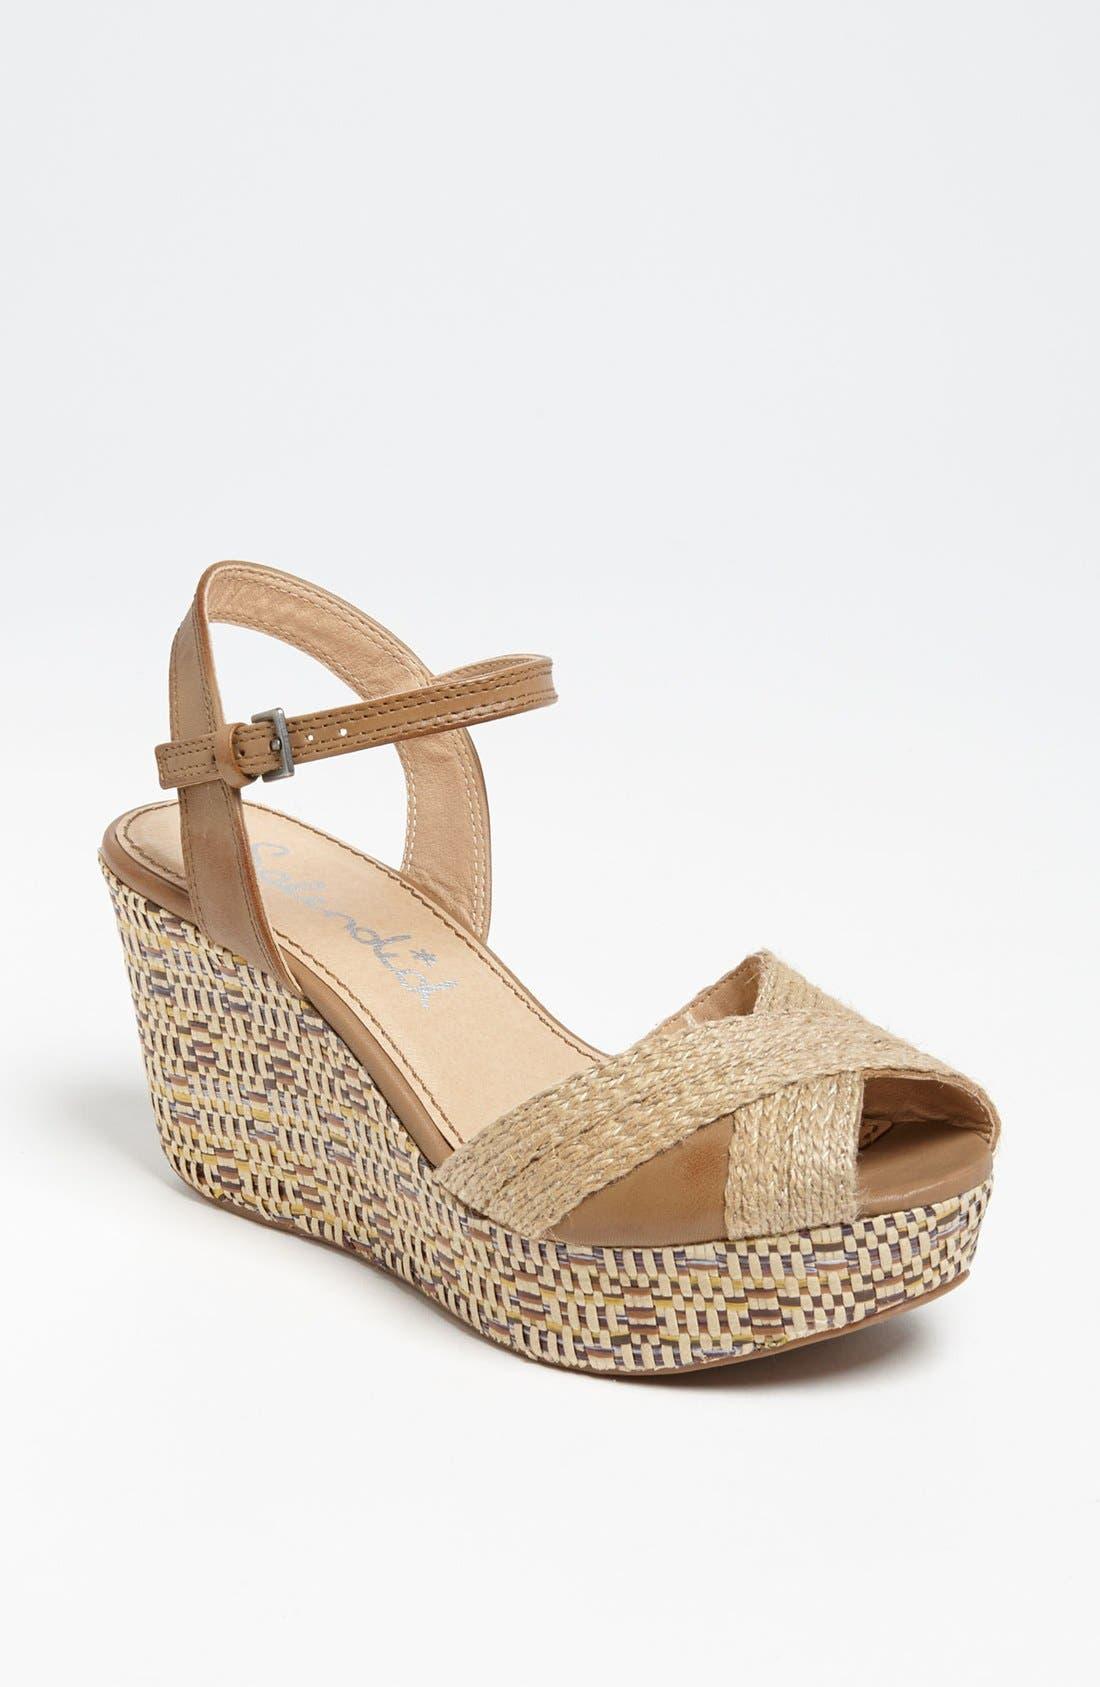 Main Image - Splendid 'Granite' Sandal